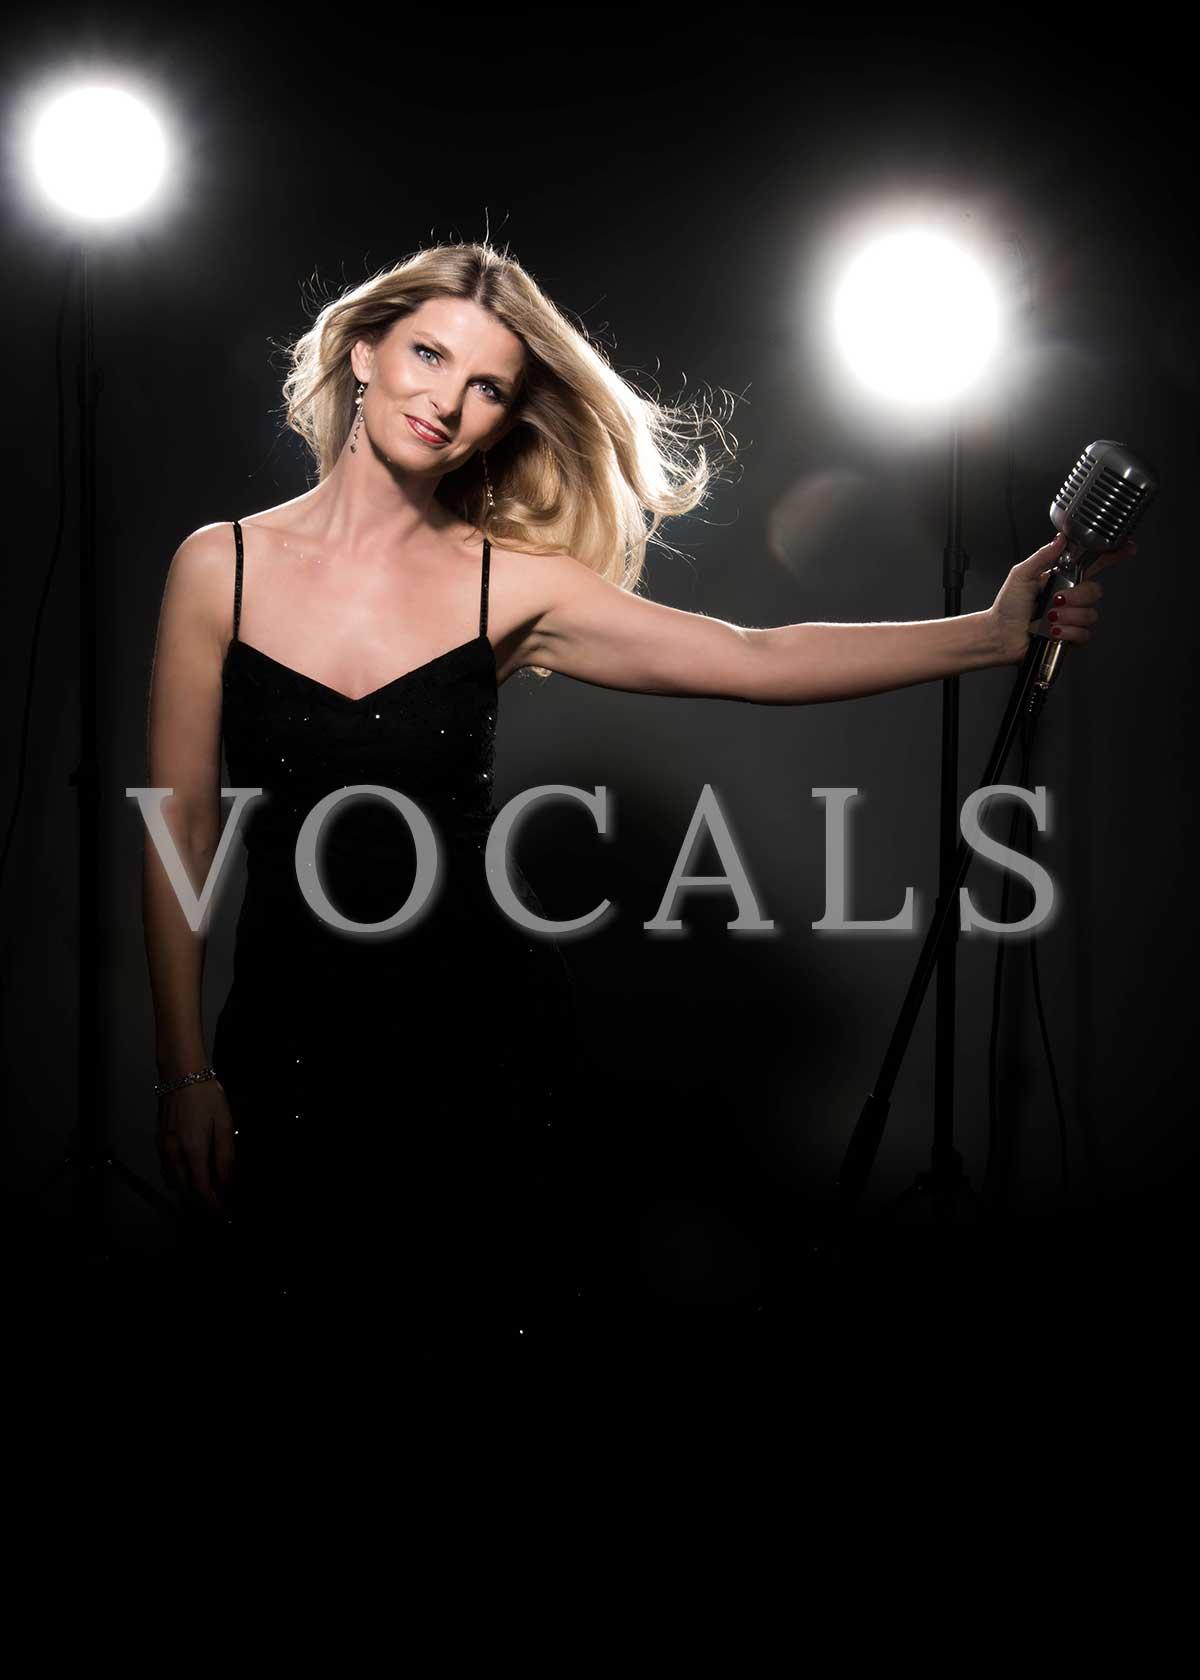 Franziska Wigger, Vocals